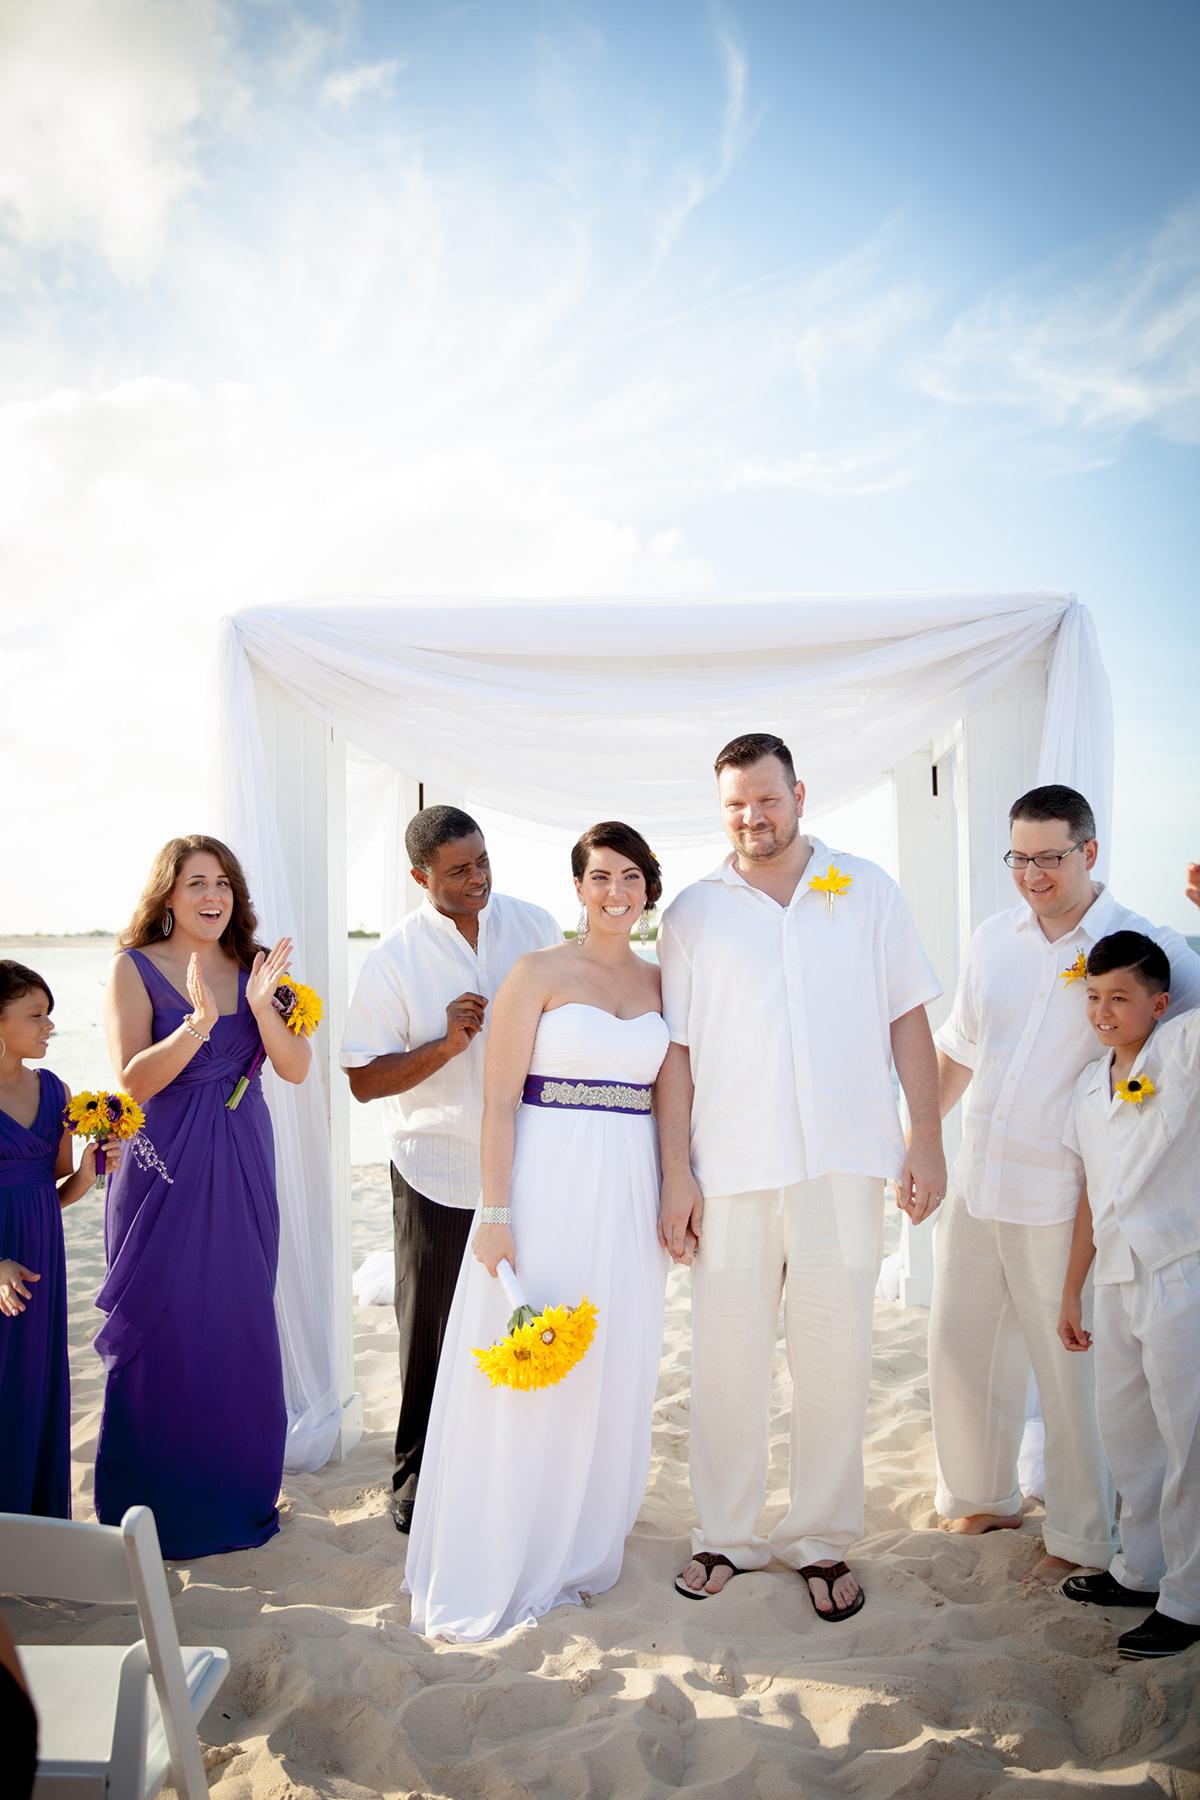 Daniela-Edvard_wedding_Dukat-Photos-1302.jpg